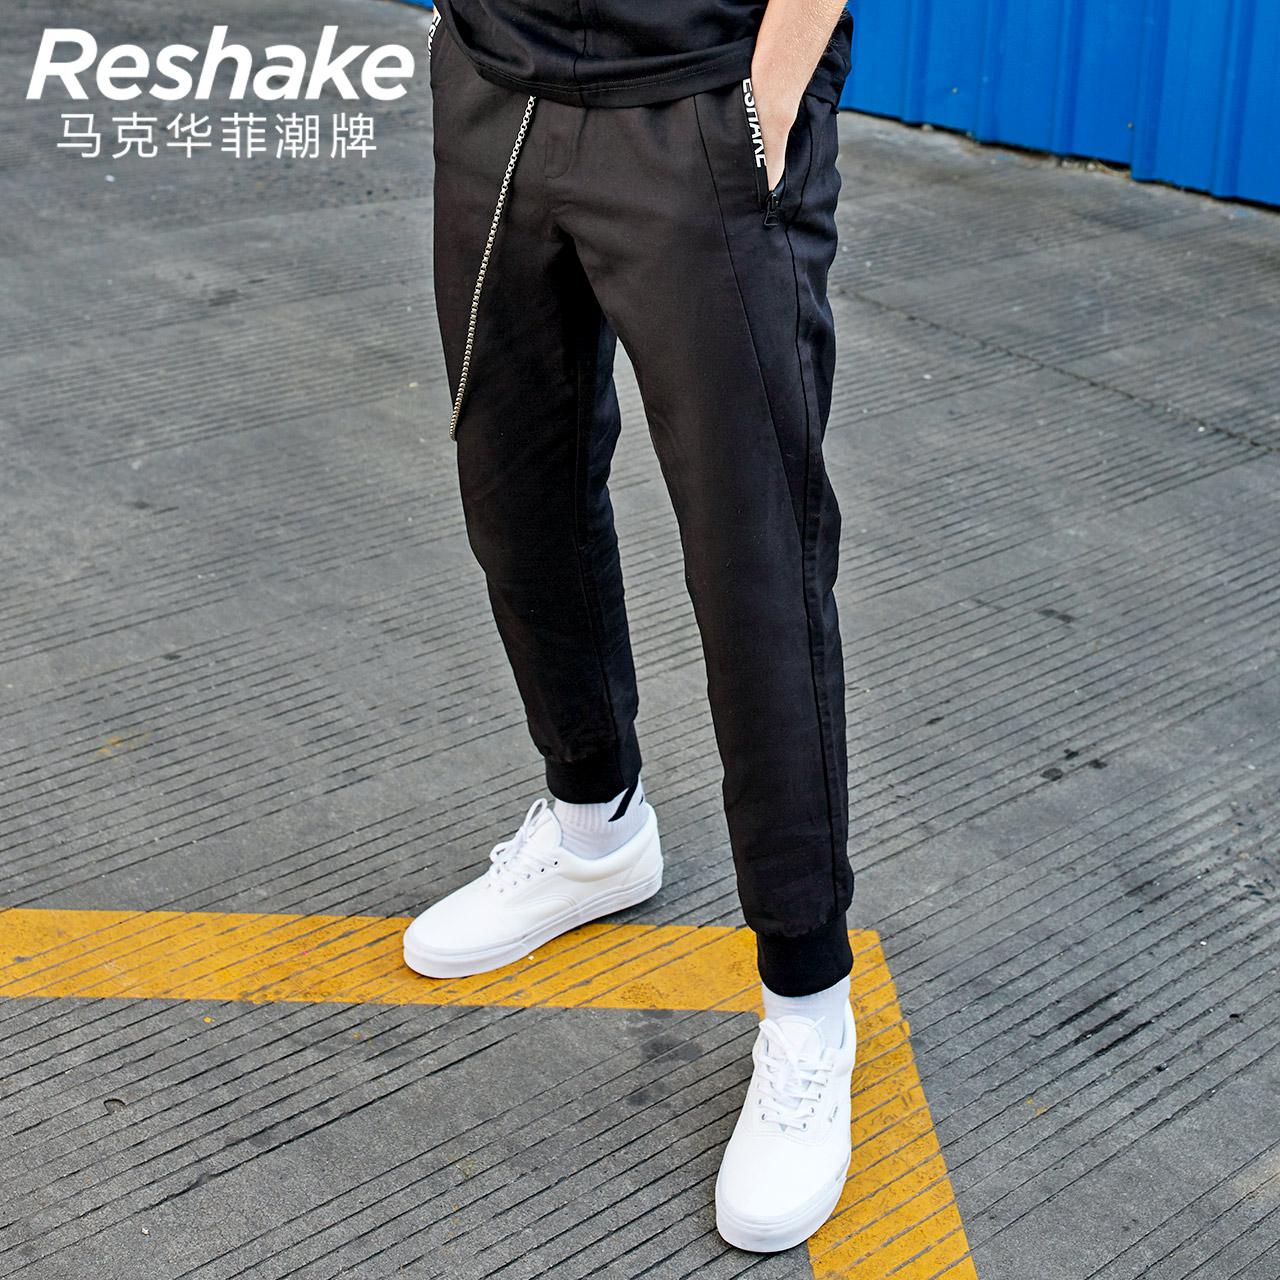 Reshake马克华菲型格18春新品男休闲长裤 运动风印花小脚裤卫裤